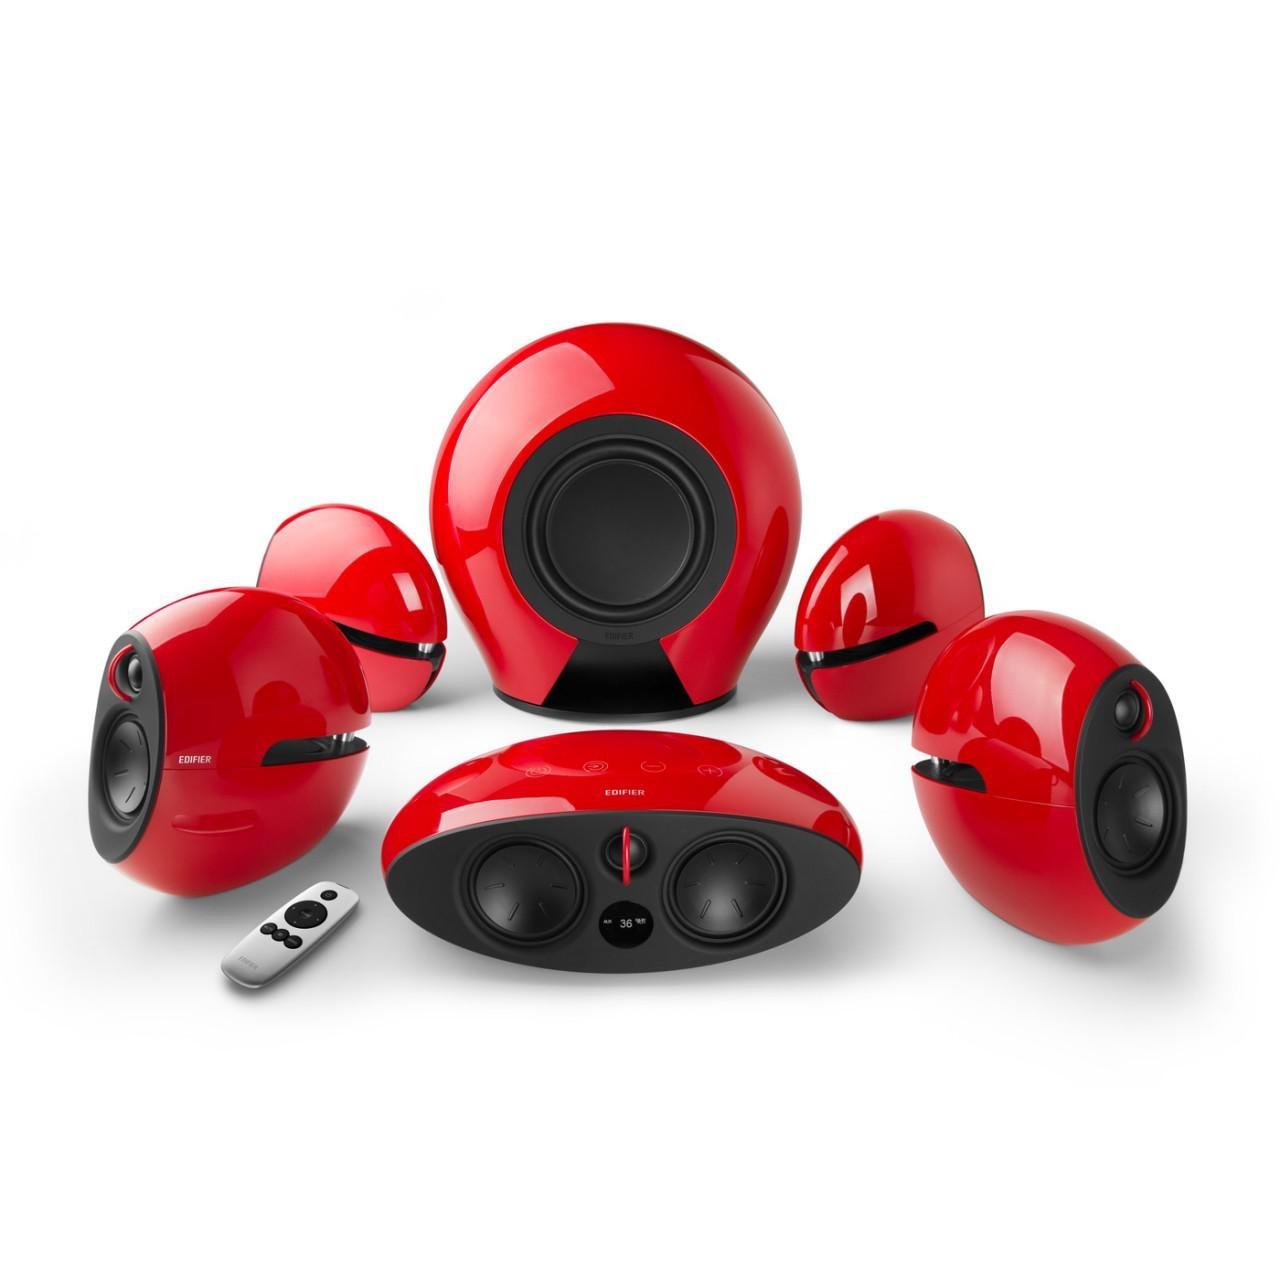 Edifier Speakers Pricelist Philippines 2018 Mdisk Headset Super Boom J278